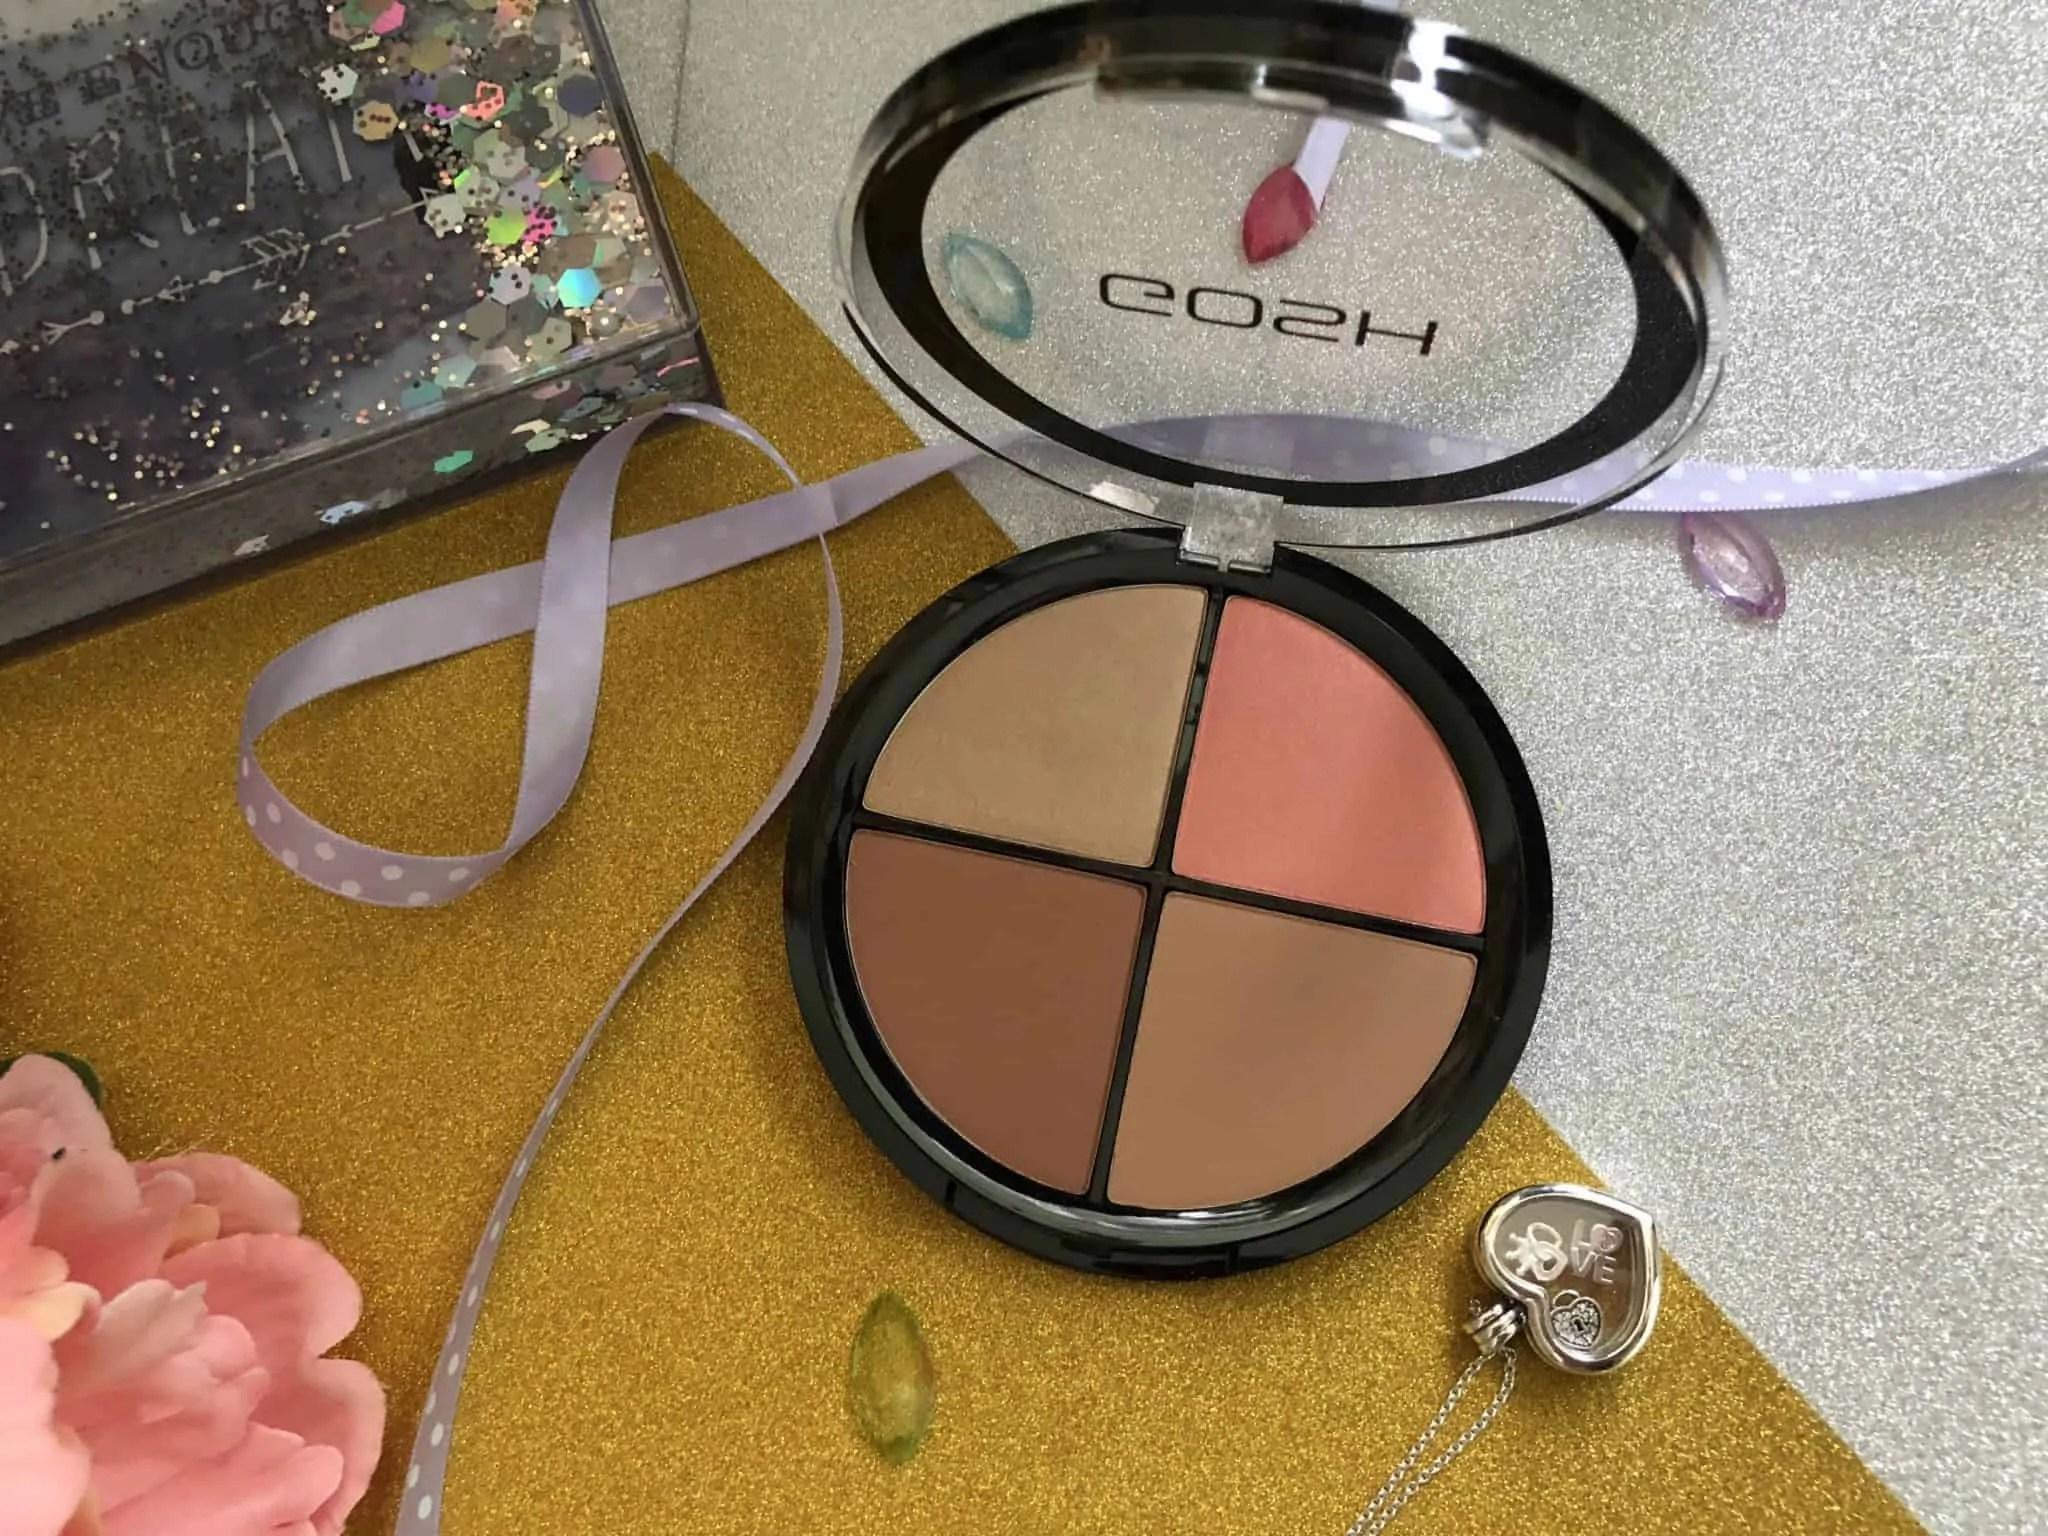 Gosh Contour n Strobe kit review shades